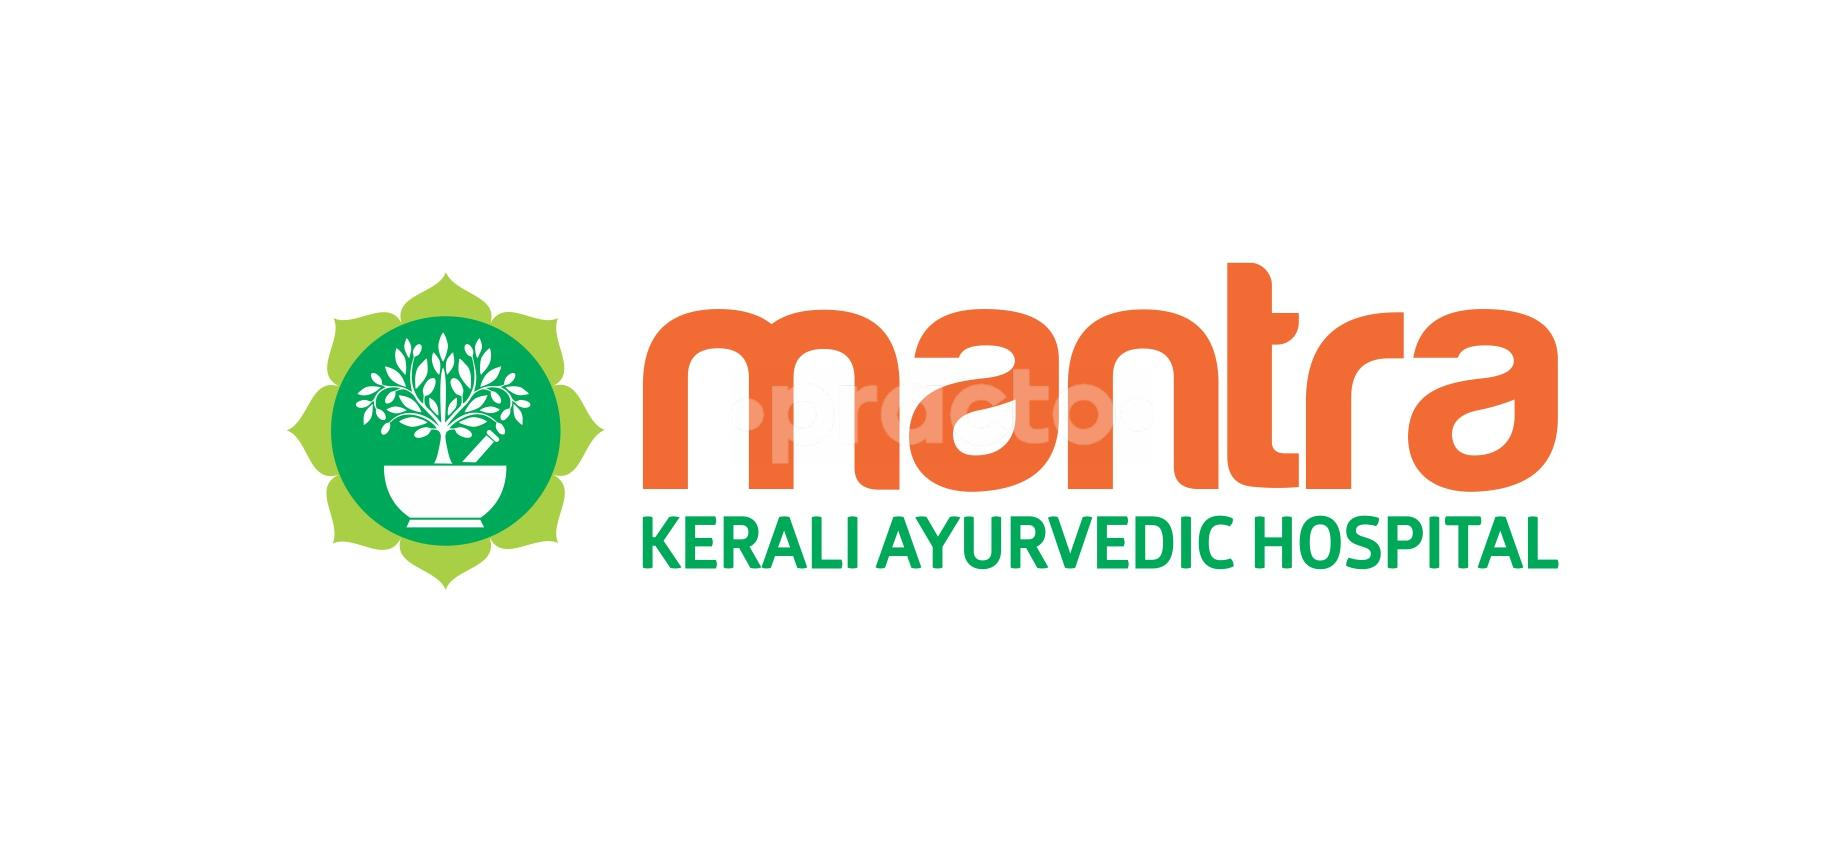 Mantra Kerali Ayurvedic Hospital